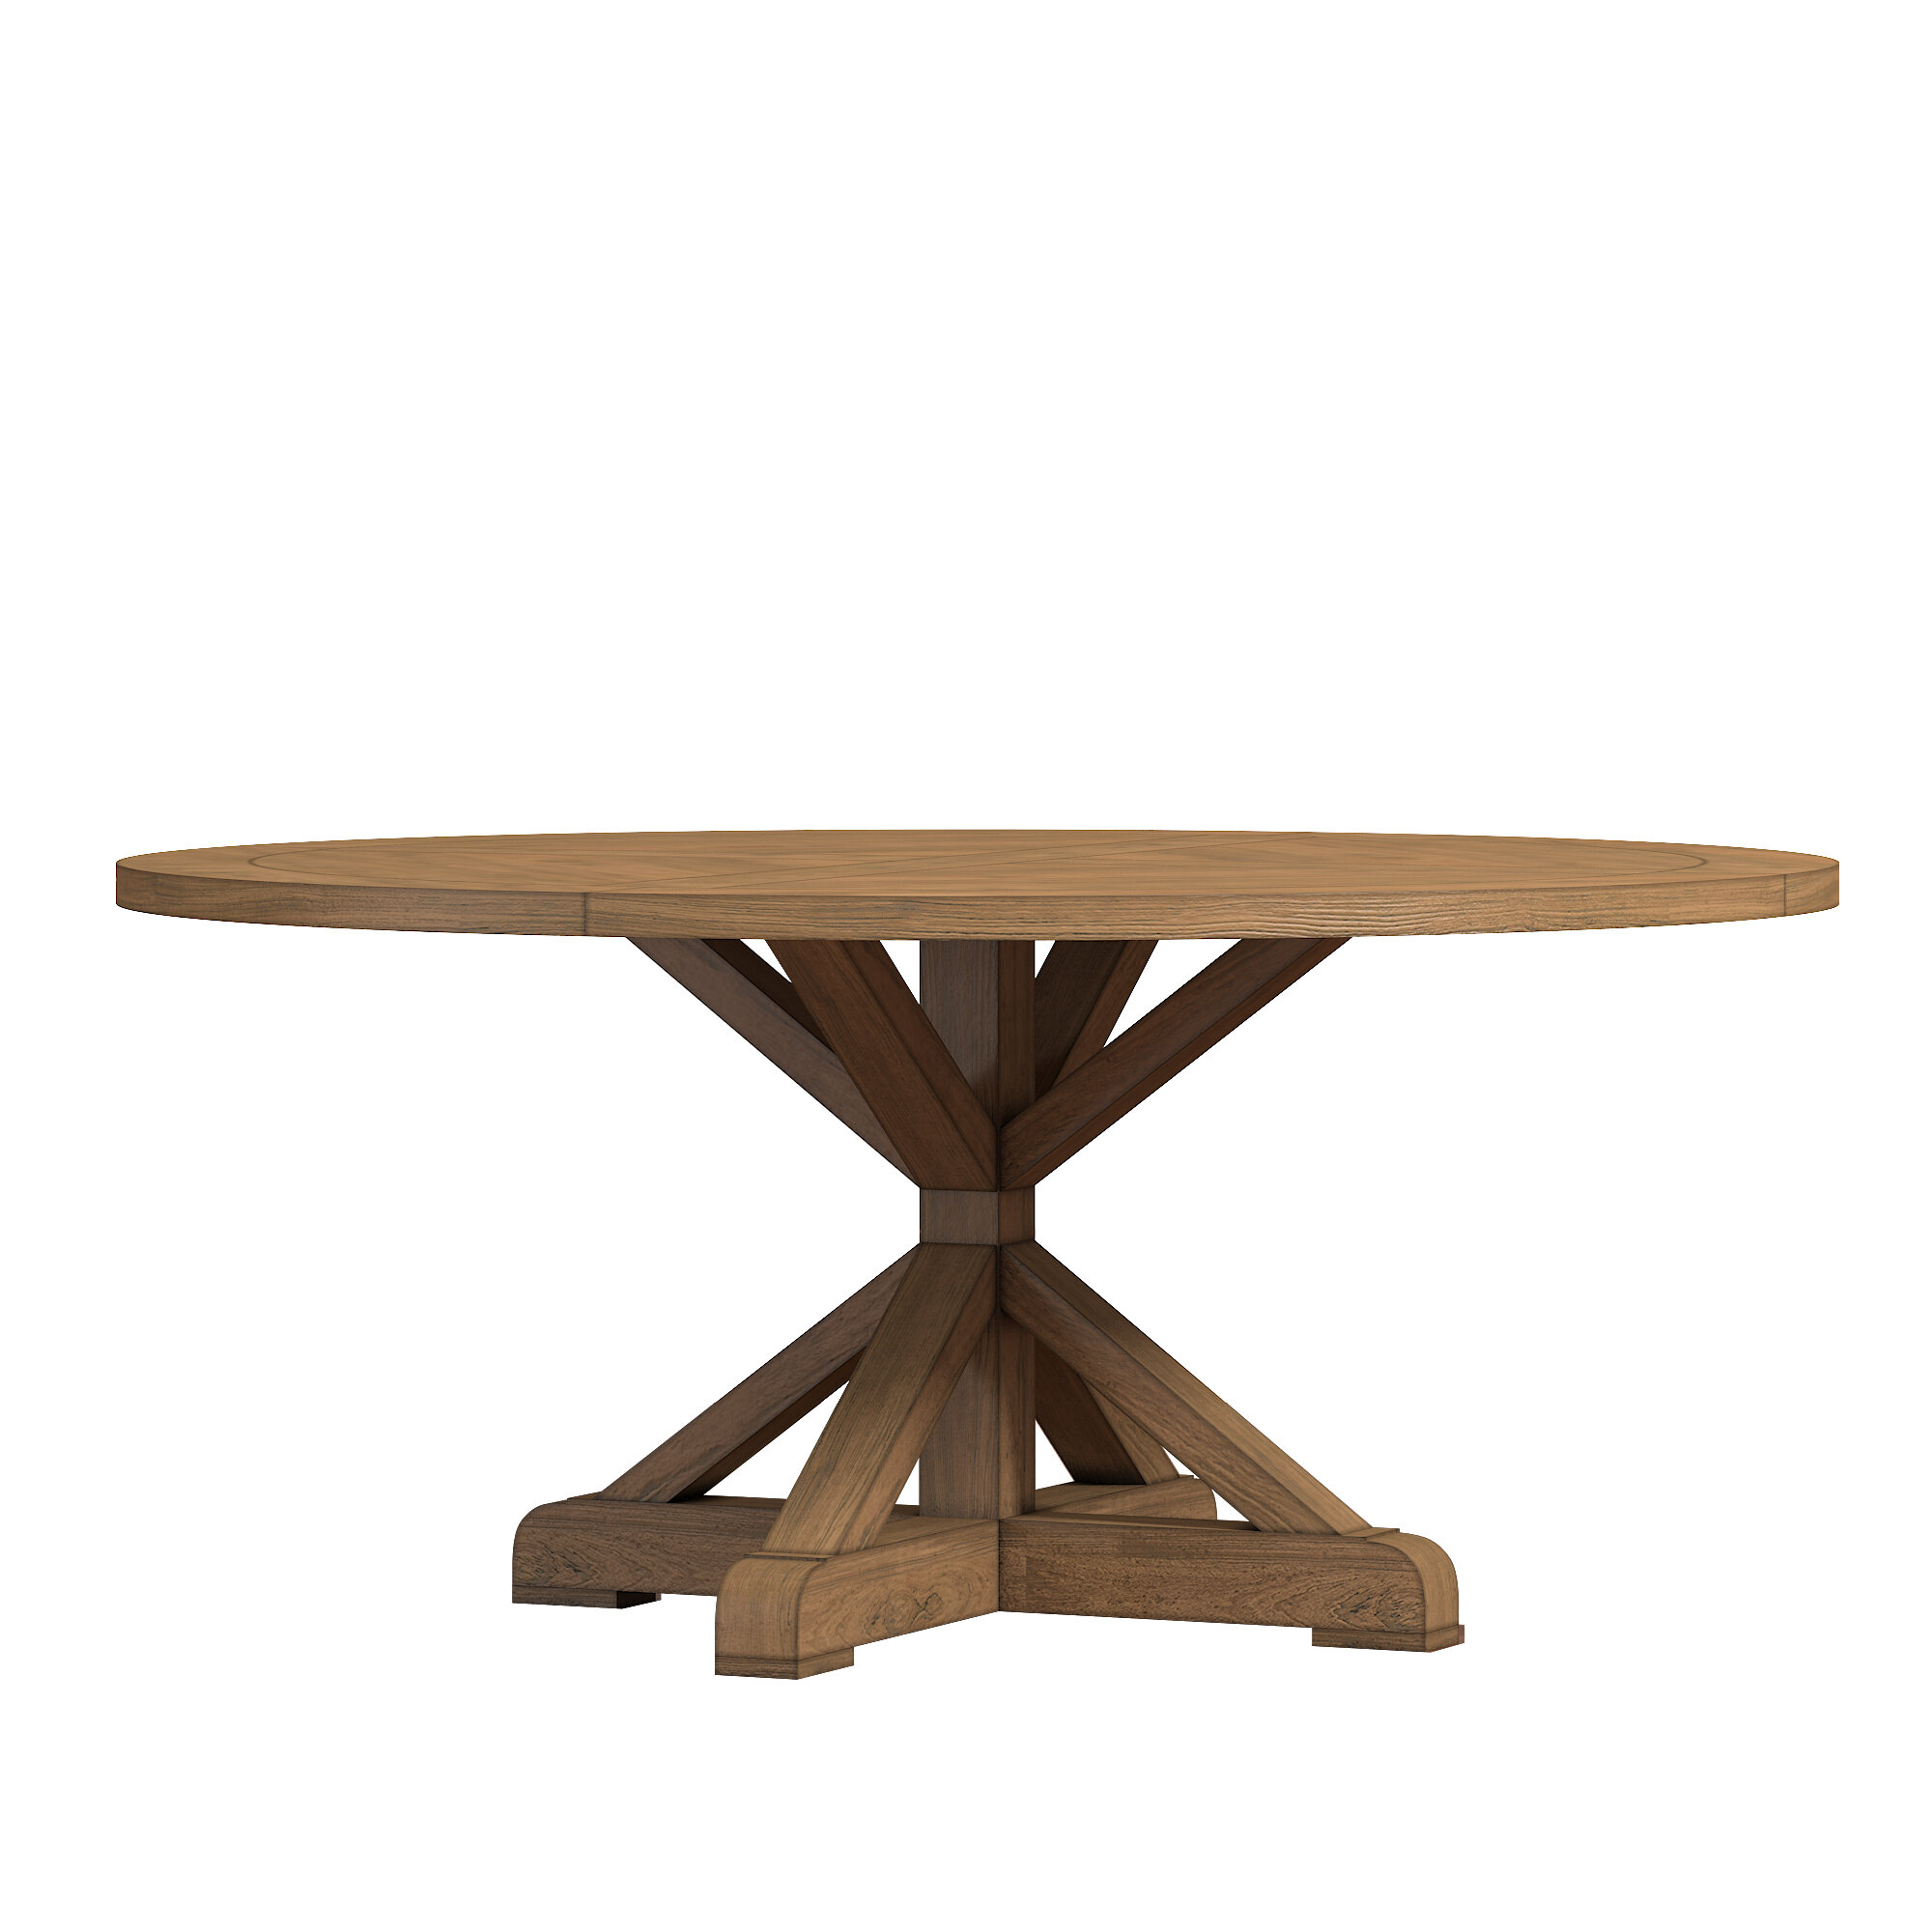 Lark Manor Peralta Round Rustic Solid Wood Dining Table Wayfair